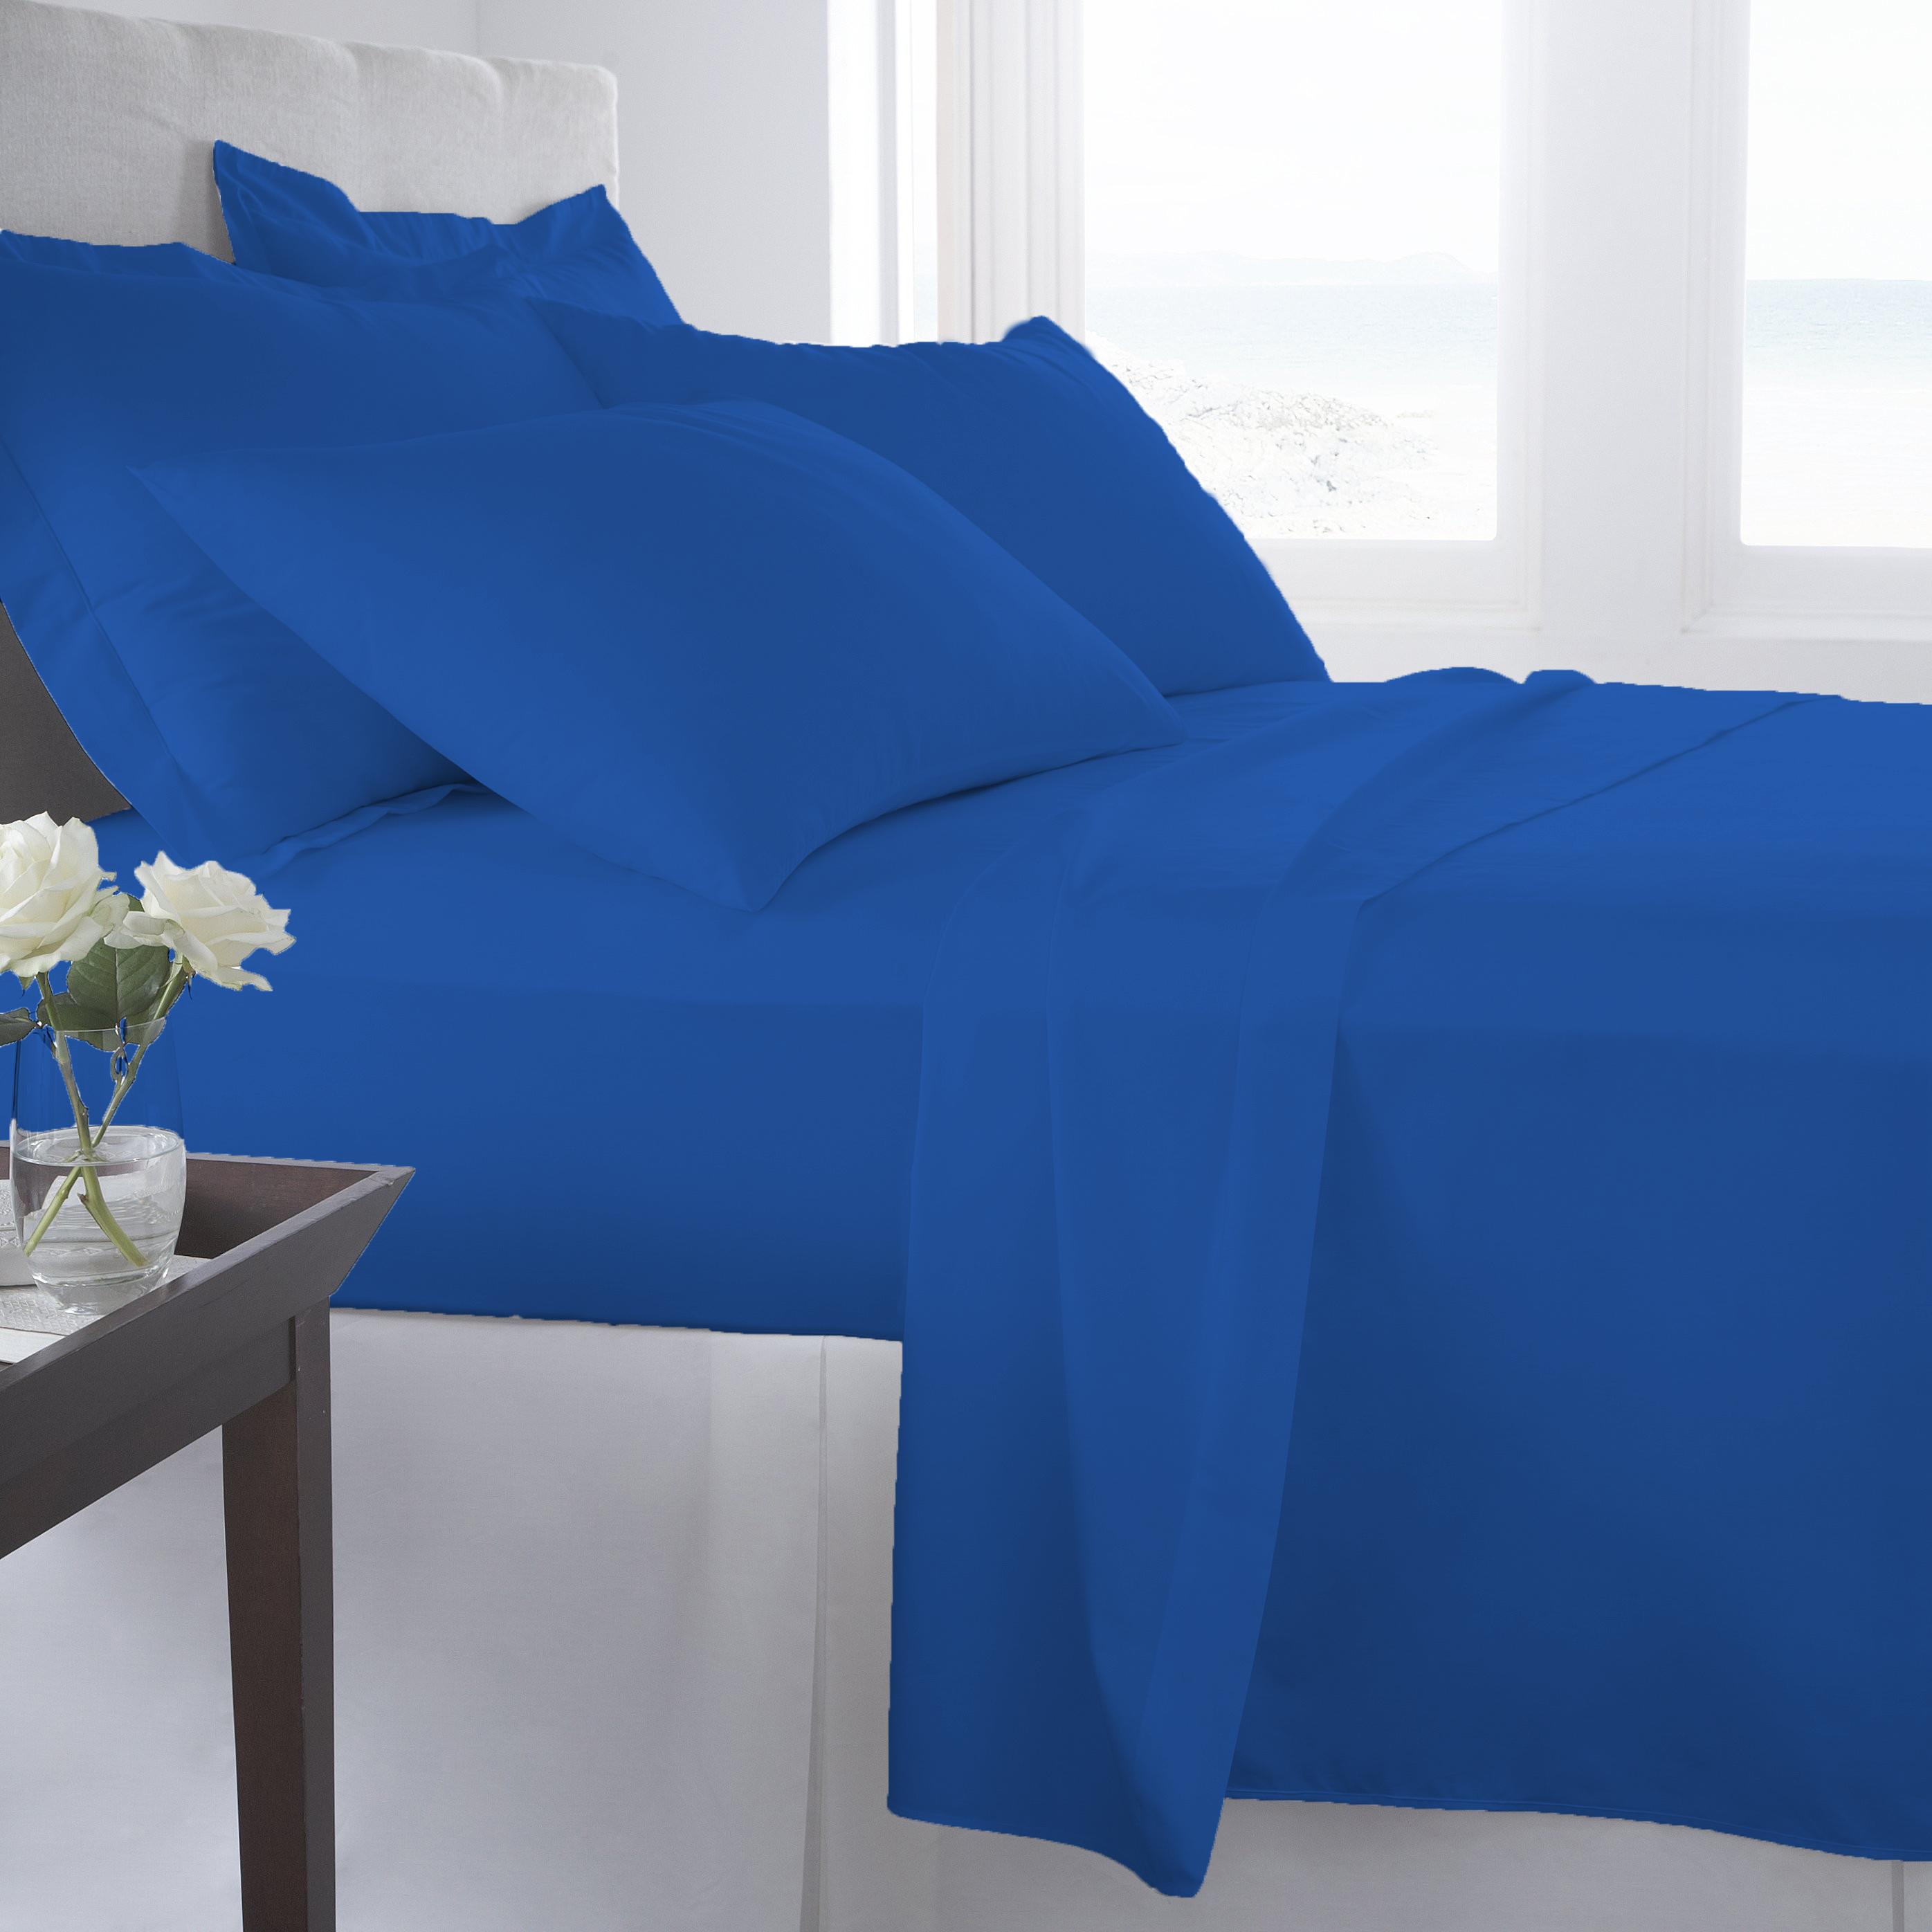 Supreme-Super-Soft-4-Piece-Bed-Sheet-Set-Deep-Pocket-Bedding-All-Colors-Sizes thumbnail 78